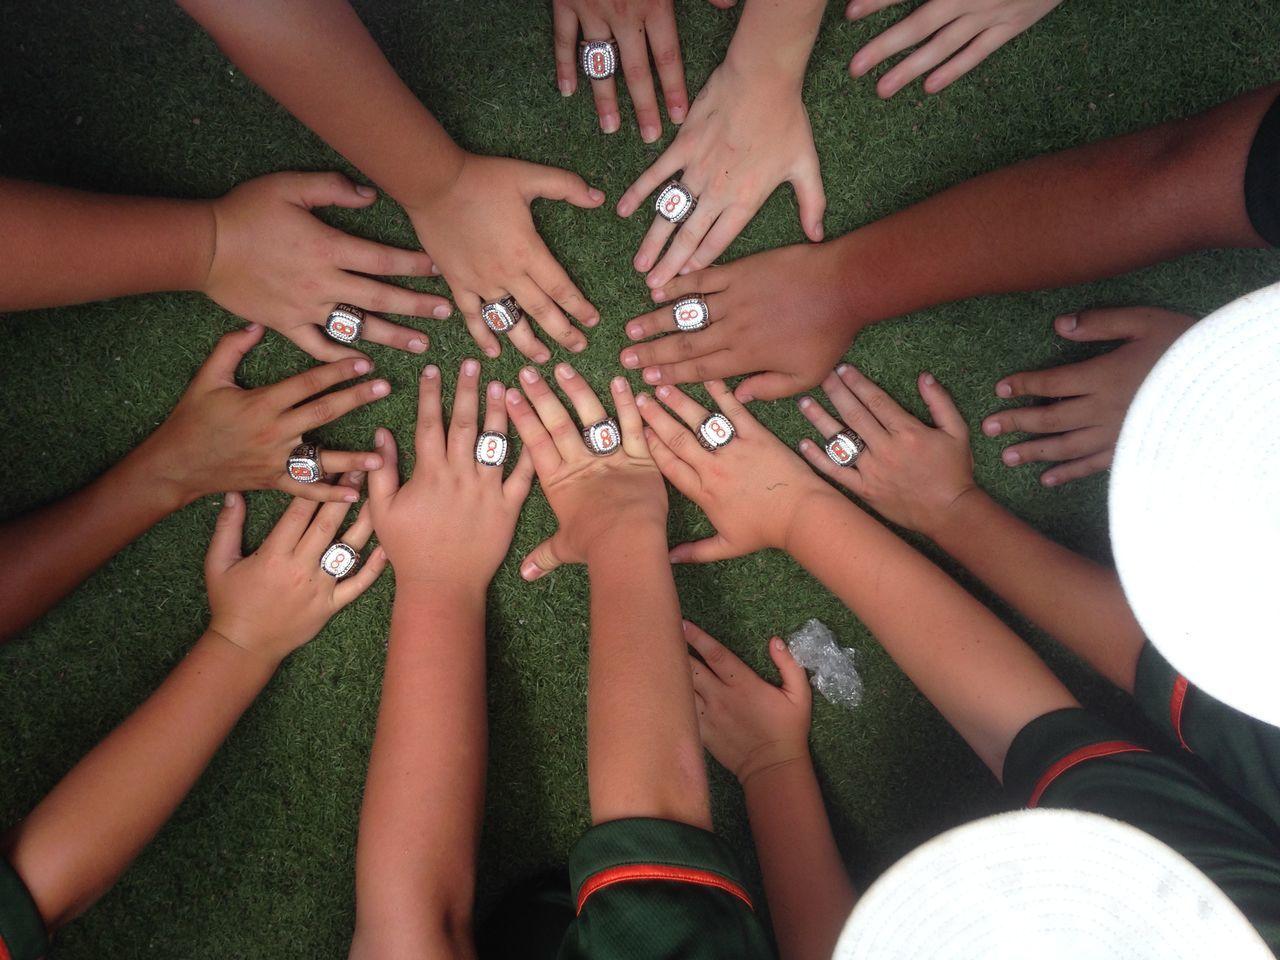 Championship Baseball Teamwork TeamworkMakesTheDreamWork Wanting This!